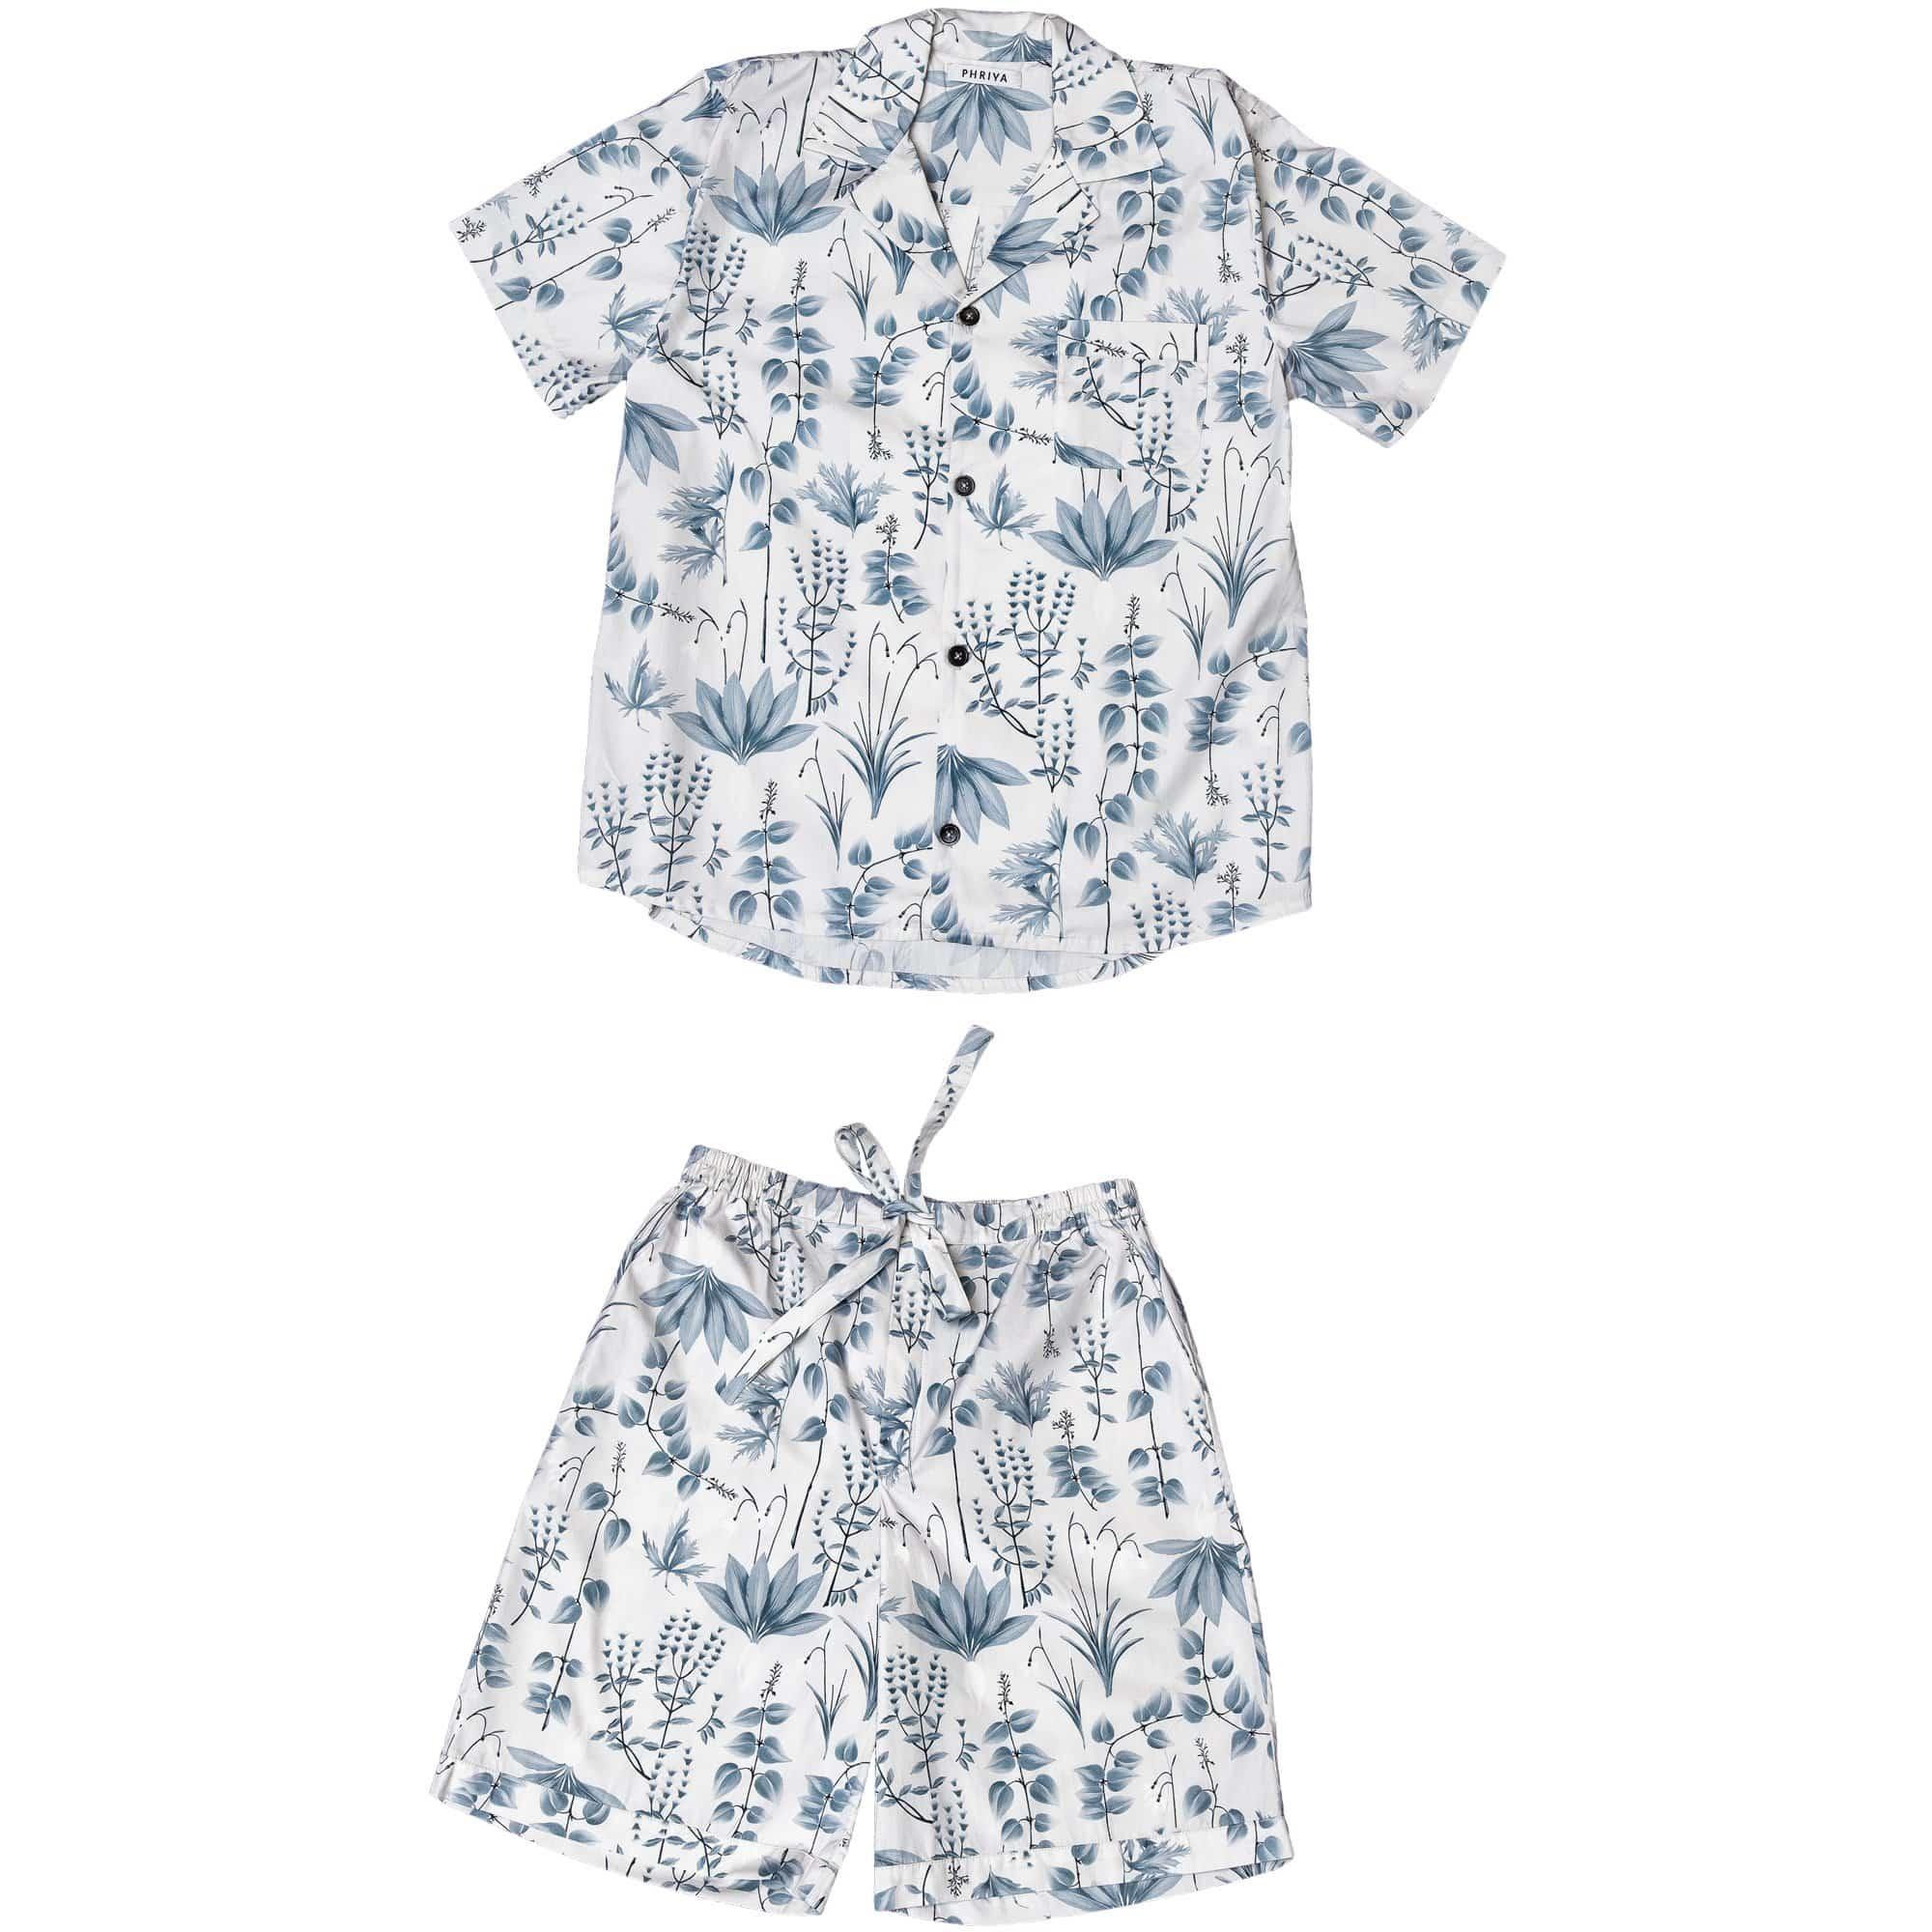 Phriya Men's Gray Circe's Garden Short Pajama Set  - multicolor - Size: One Size